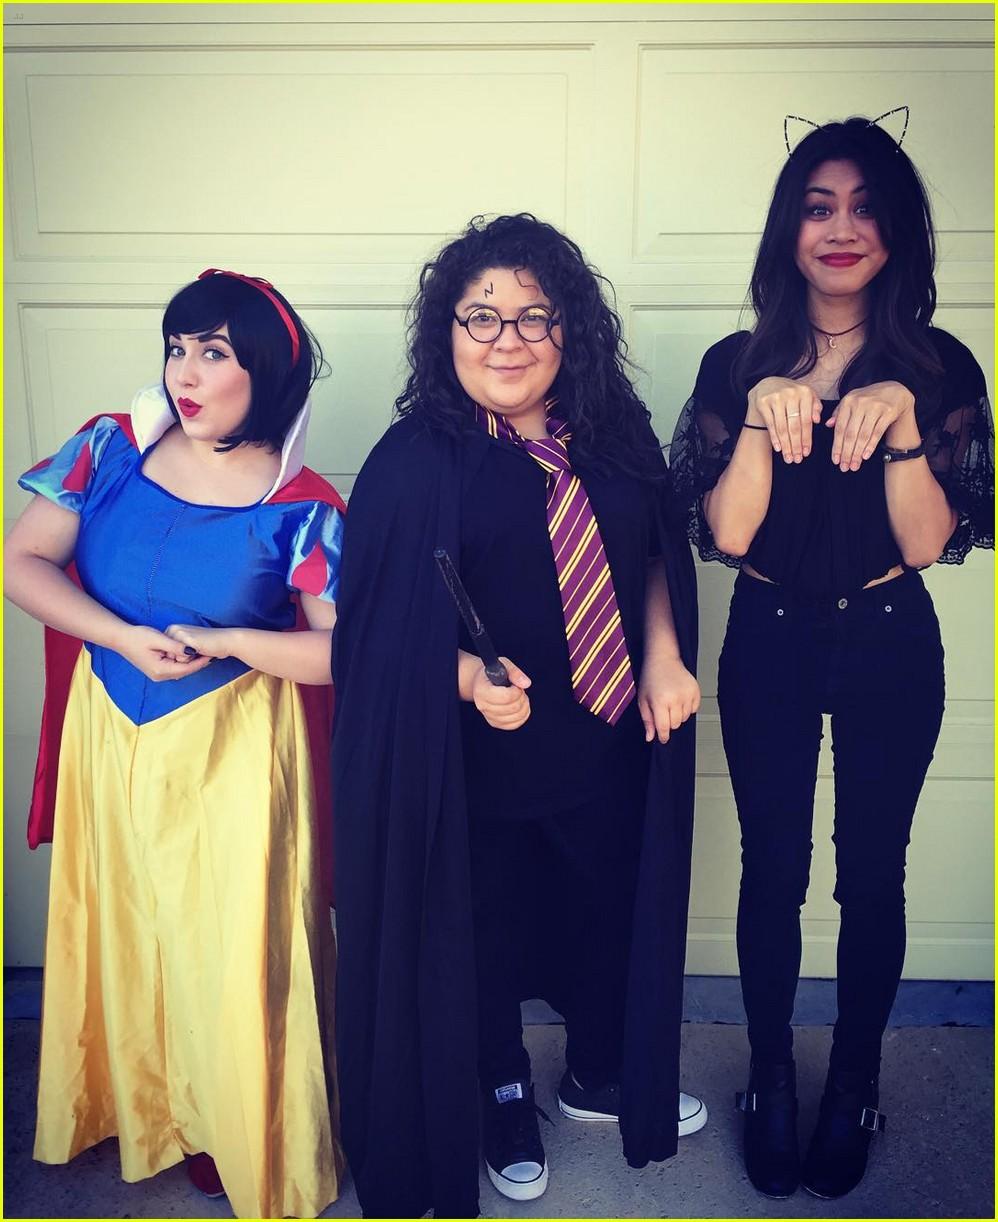 celeb halloween costumes might have missed 06  sc 1 st  Just Jared Jr. & Reignu0027 u0026 u0027Liv u0026 Maddieu0027 Casts Totally Owned Halloween 2015 - See All ...